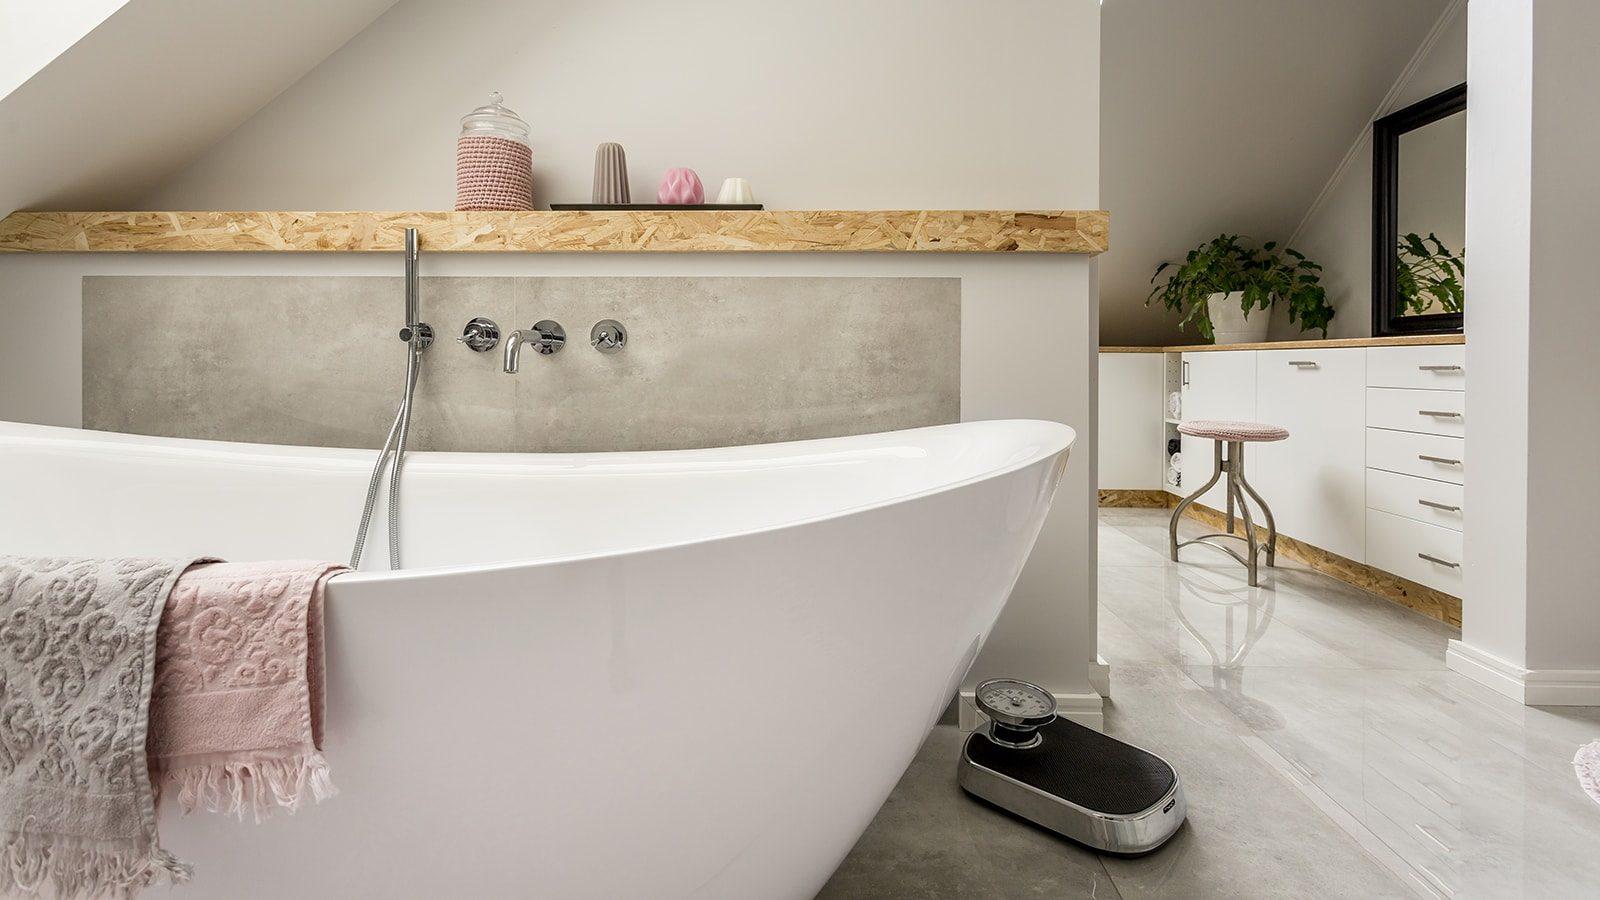 Bath tub in ensuite bathroom